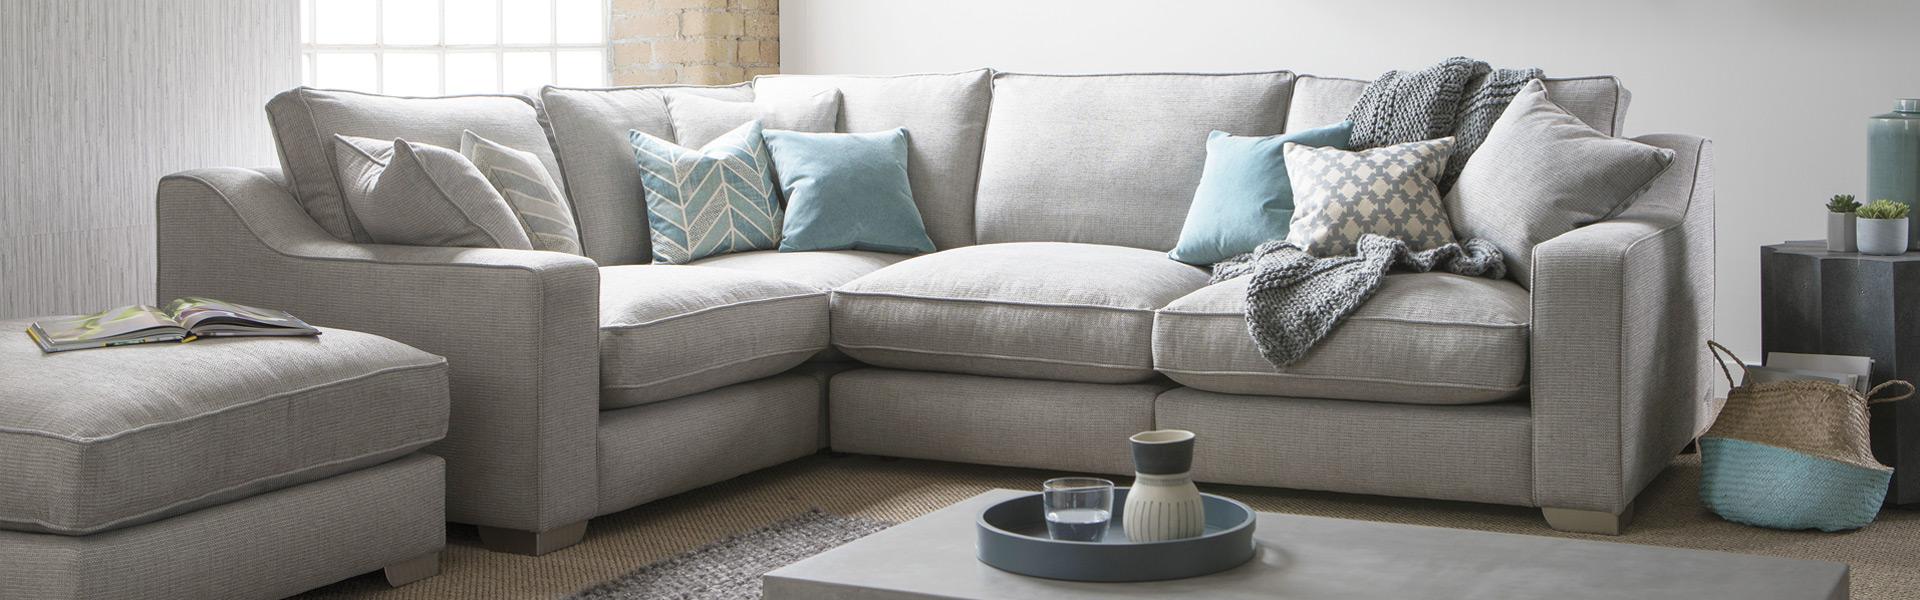 Imogen Modular Sofa Range